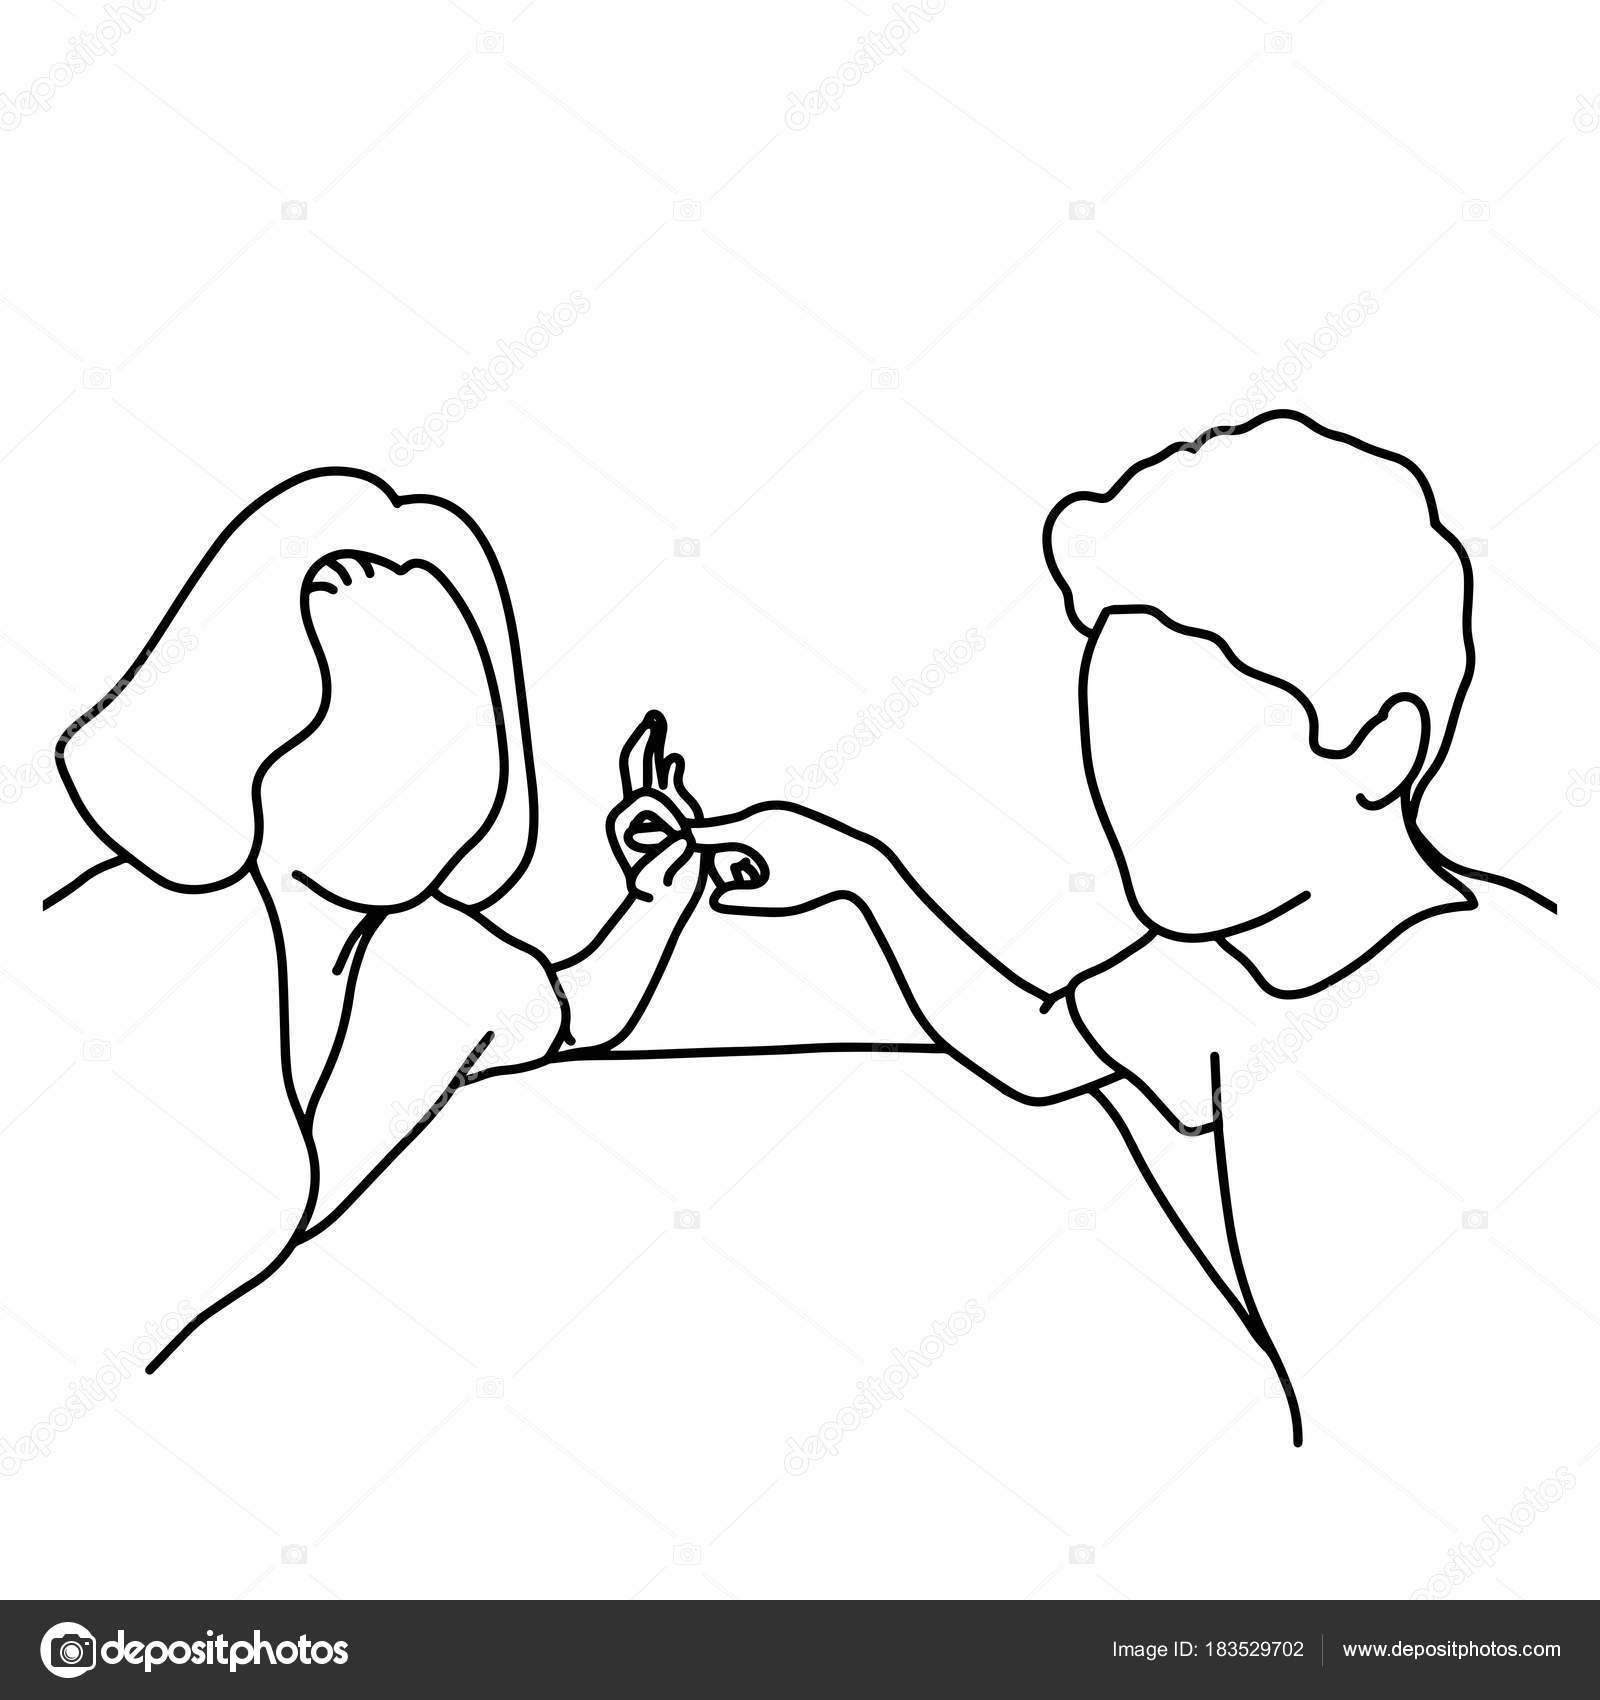 Rysowane kreskówka seks